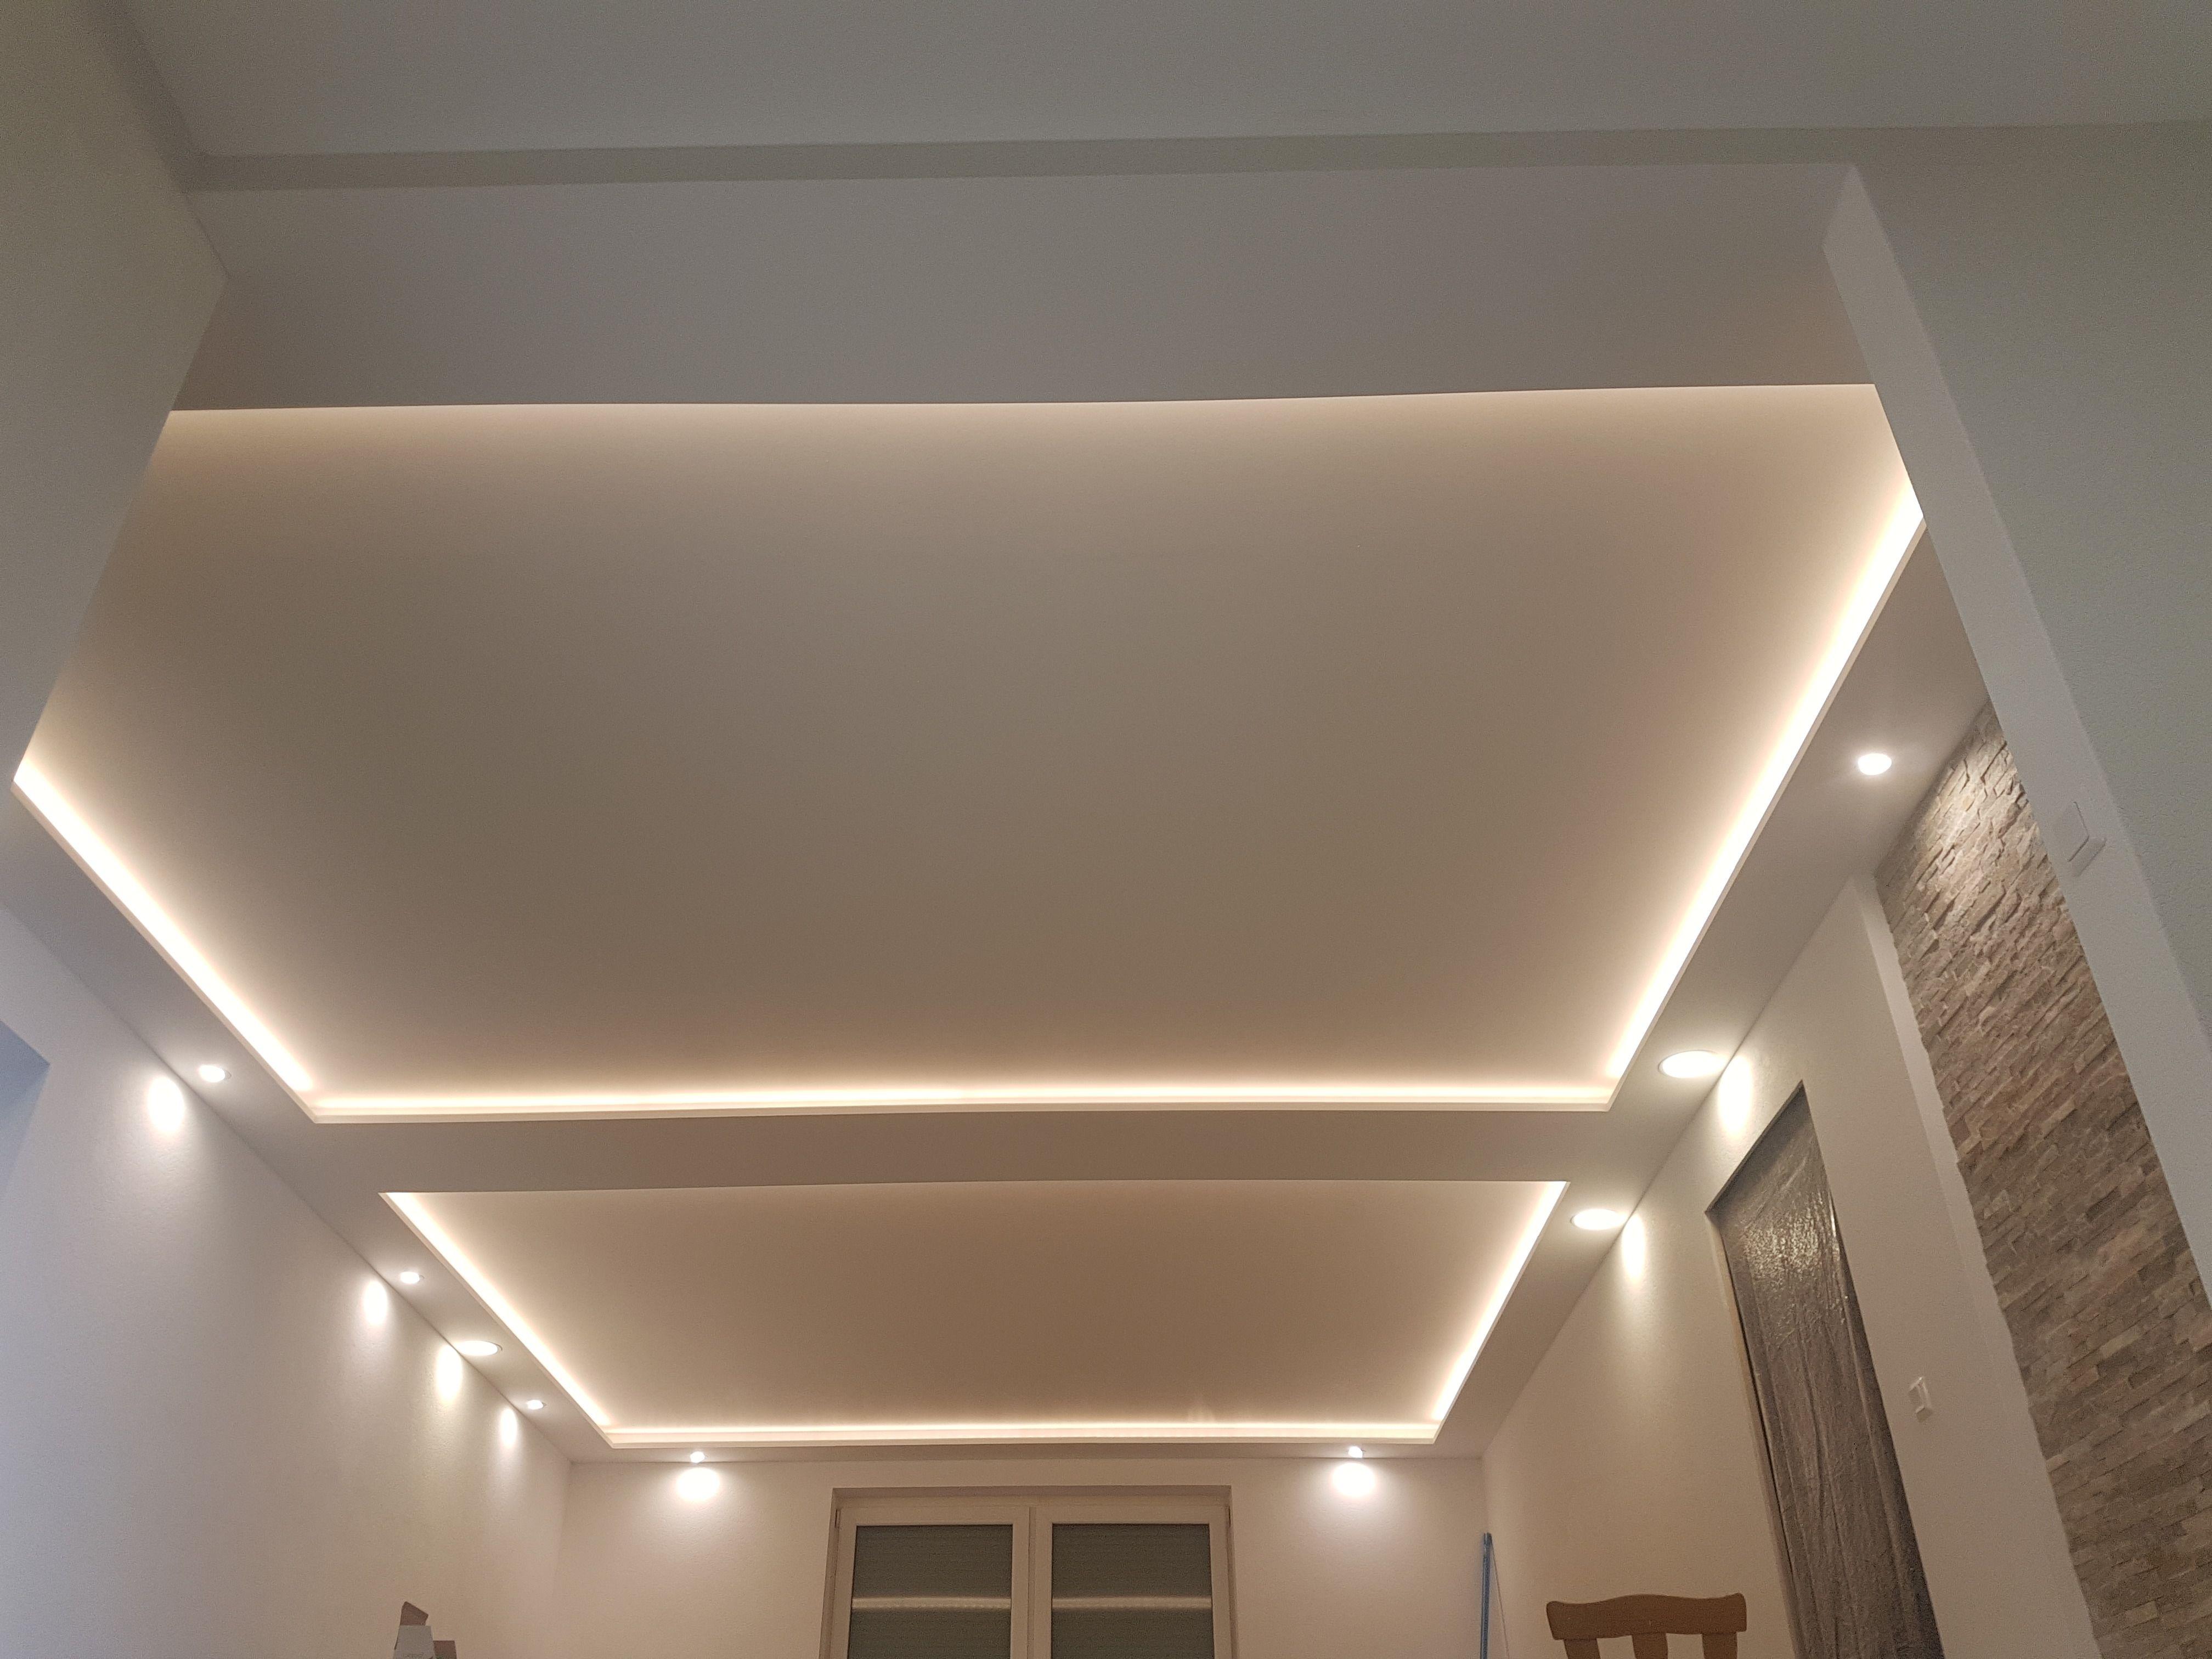 indirekte beleuchtung bauanleitung zum selber bauen best of 1 2 do projekte pinterest. Black Bedroom Furniture Sets. Home Design Ideas